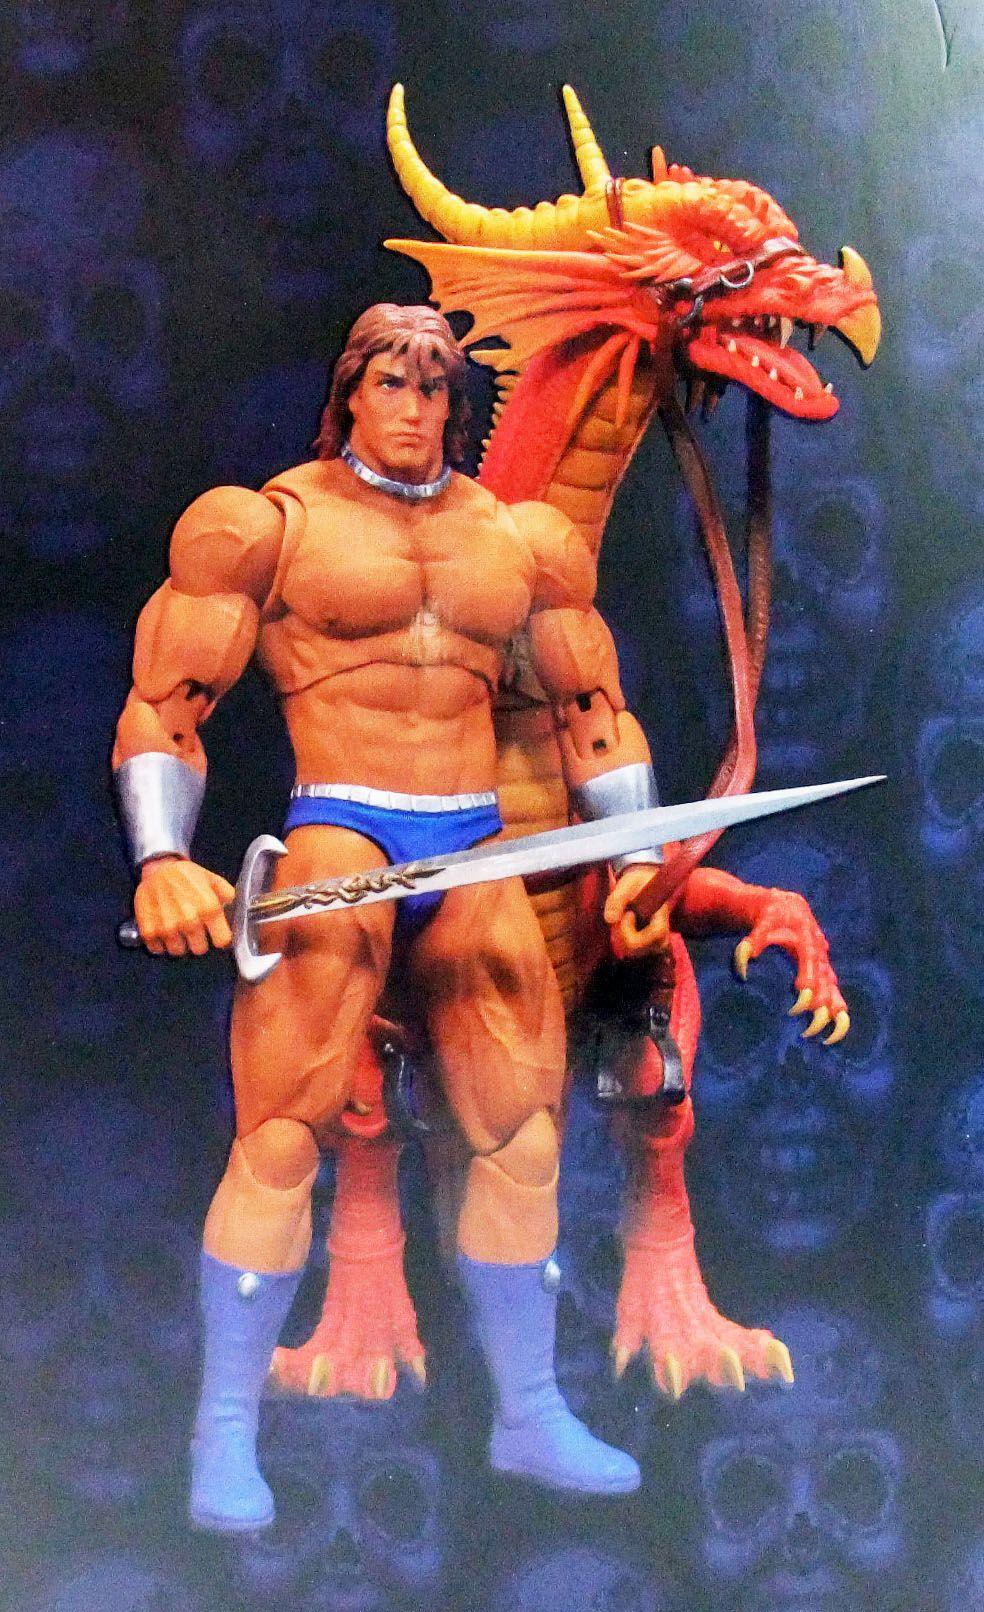 Golden Axe - Storm Collectibles - Ax Battler 1:12 scale figure